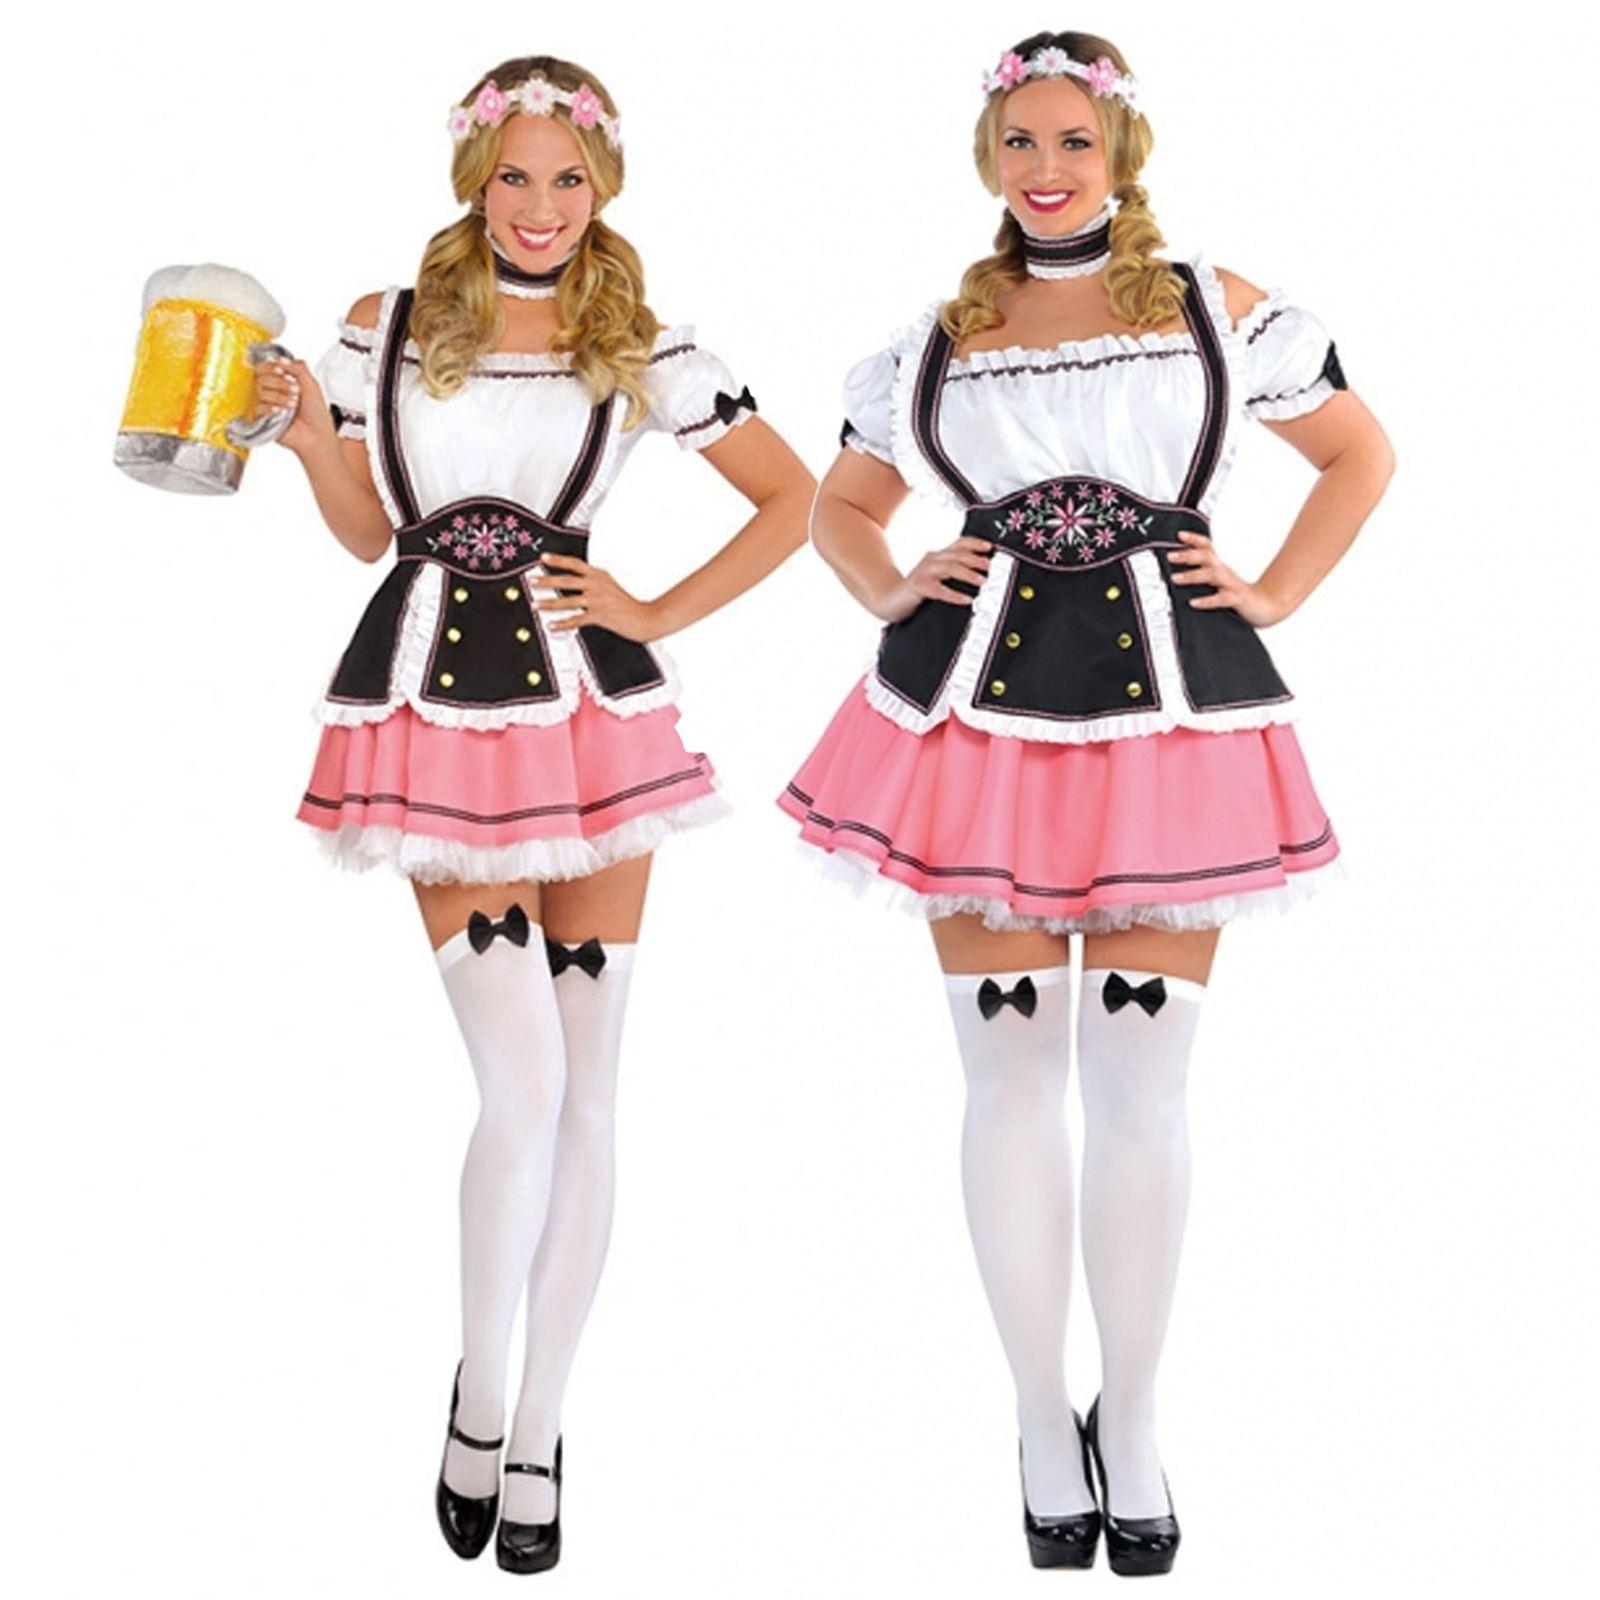 ladies womens oktobermiss oktoberfest bavarian beer. Black Bedroom Furniture Sets. Home Design Ideas